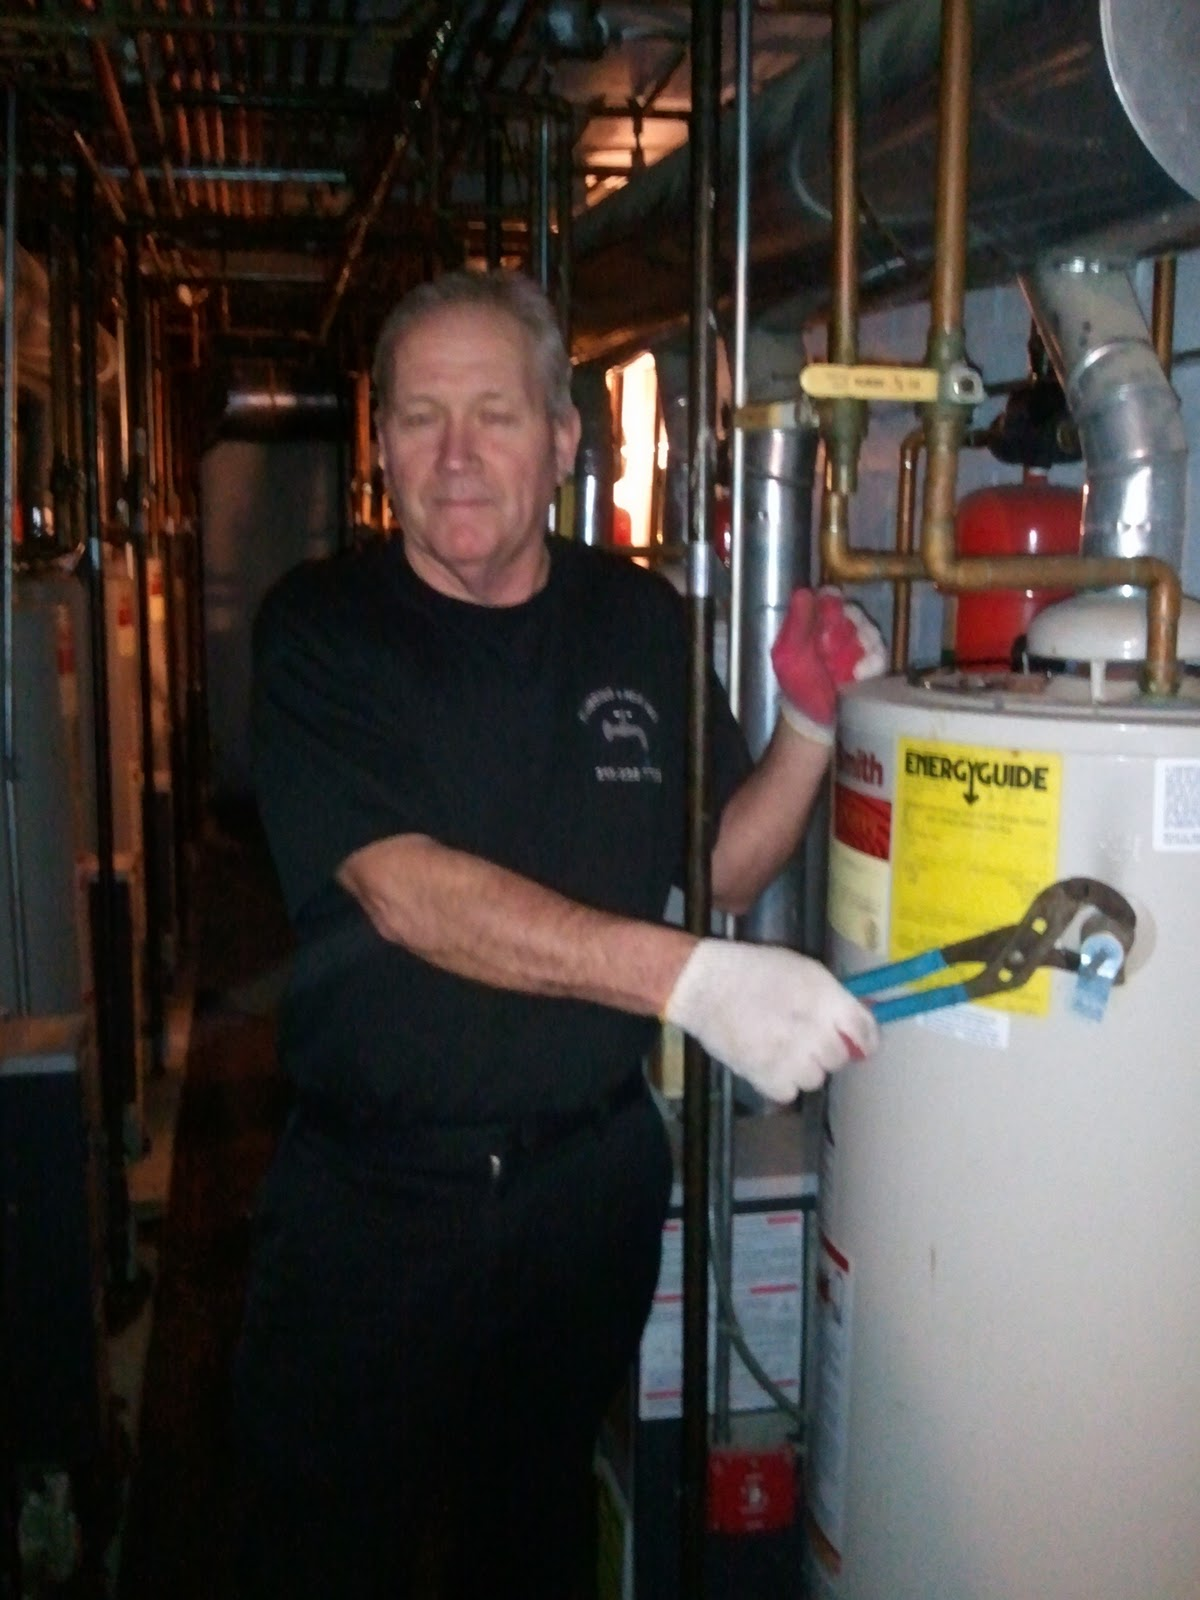 Hot Water Heater NYC plumber, Manhattan NY Plumbing NYC